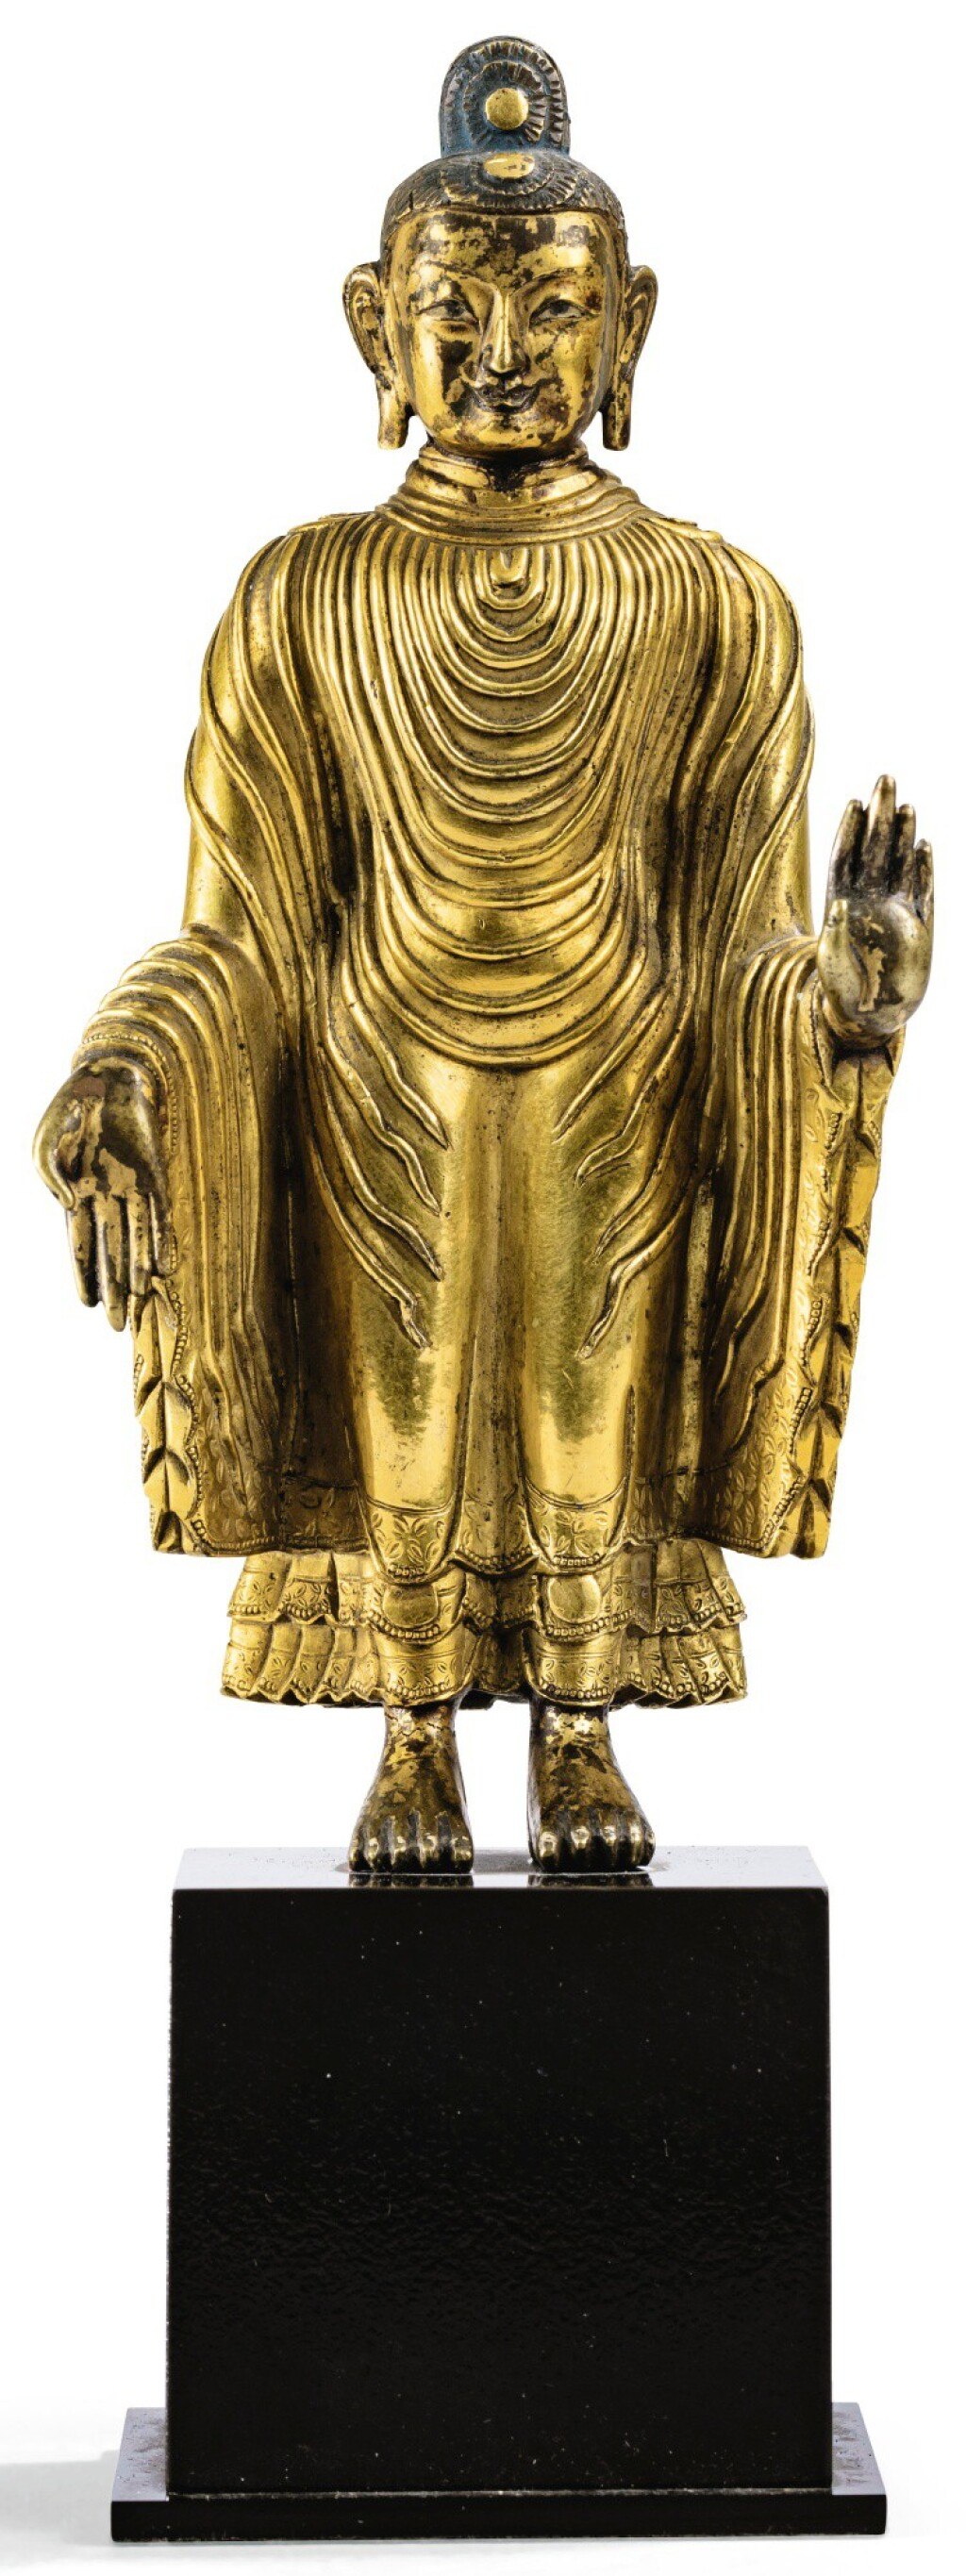 STATUETTE DE BOUDDHA MAITREYA EN BRONZE DORÉ DYNASTIE QING, XVIIIE SIÈCLE | 清十八世紀 鎏金銅彌勒佛立像 | A gilt-bronze figure of Maitreya, Qing Dynasty, 18th century